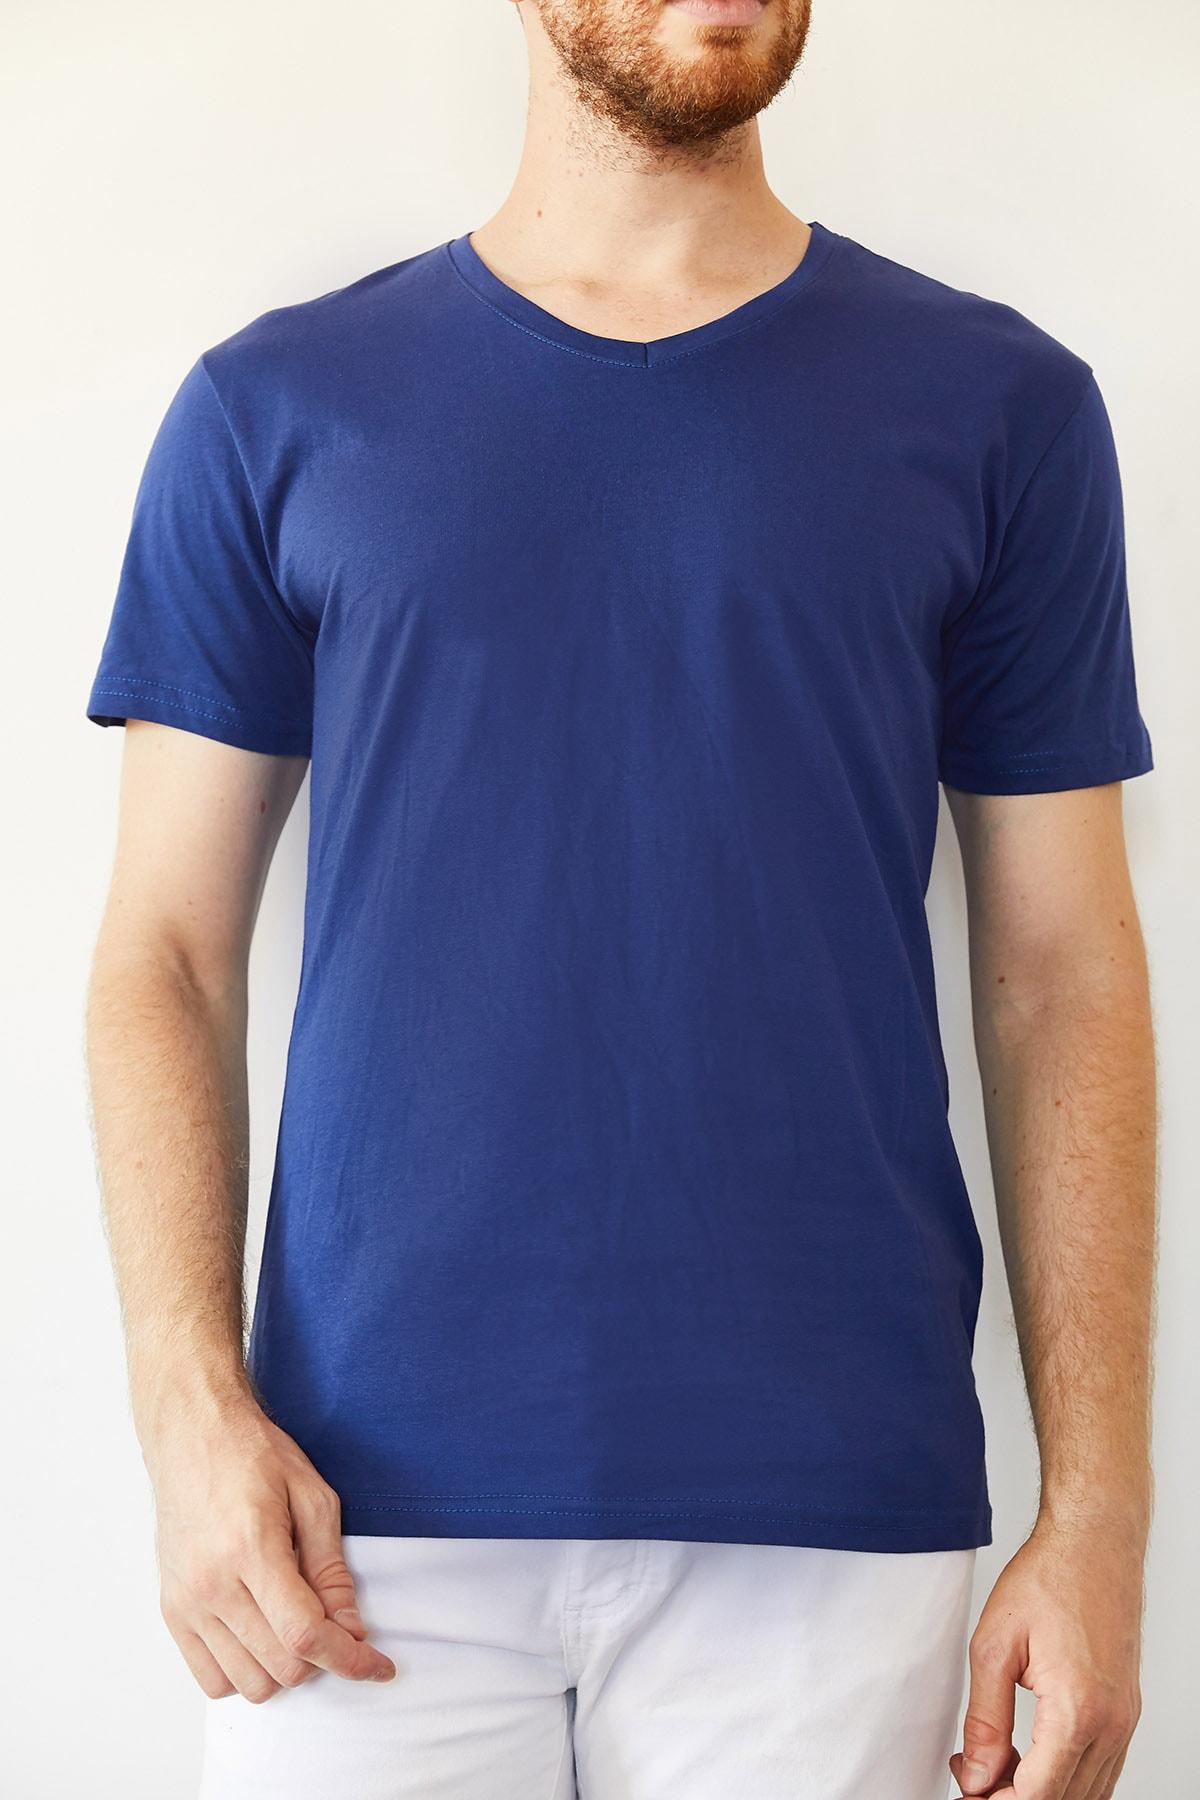 XHAN Erkek Lacivert Indigo V Yaka Basic T-shirt 0yxe1-44123-27 1